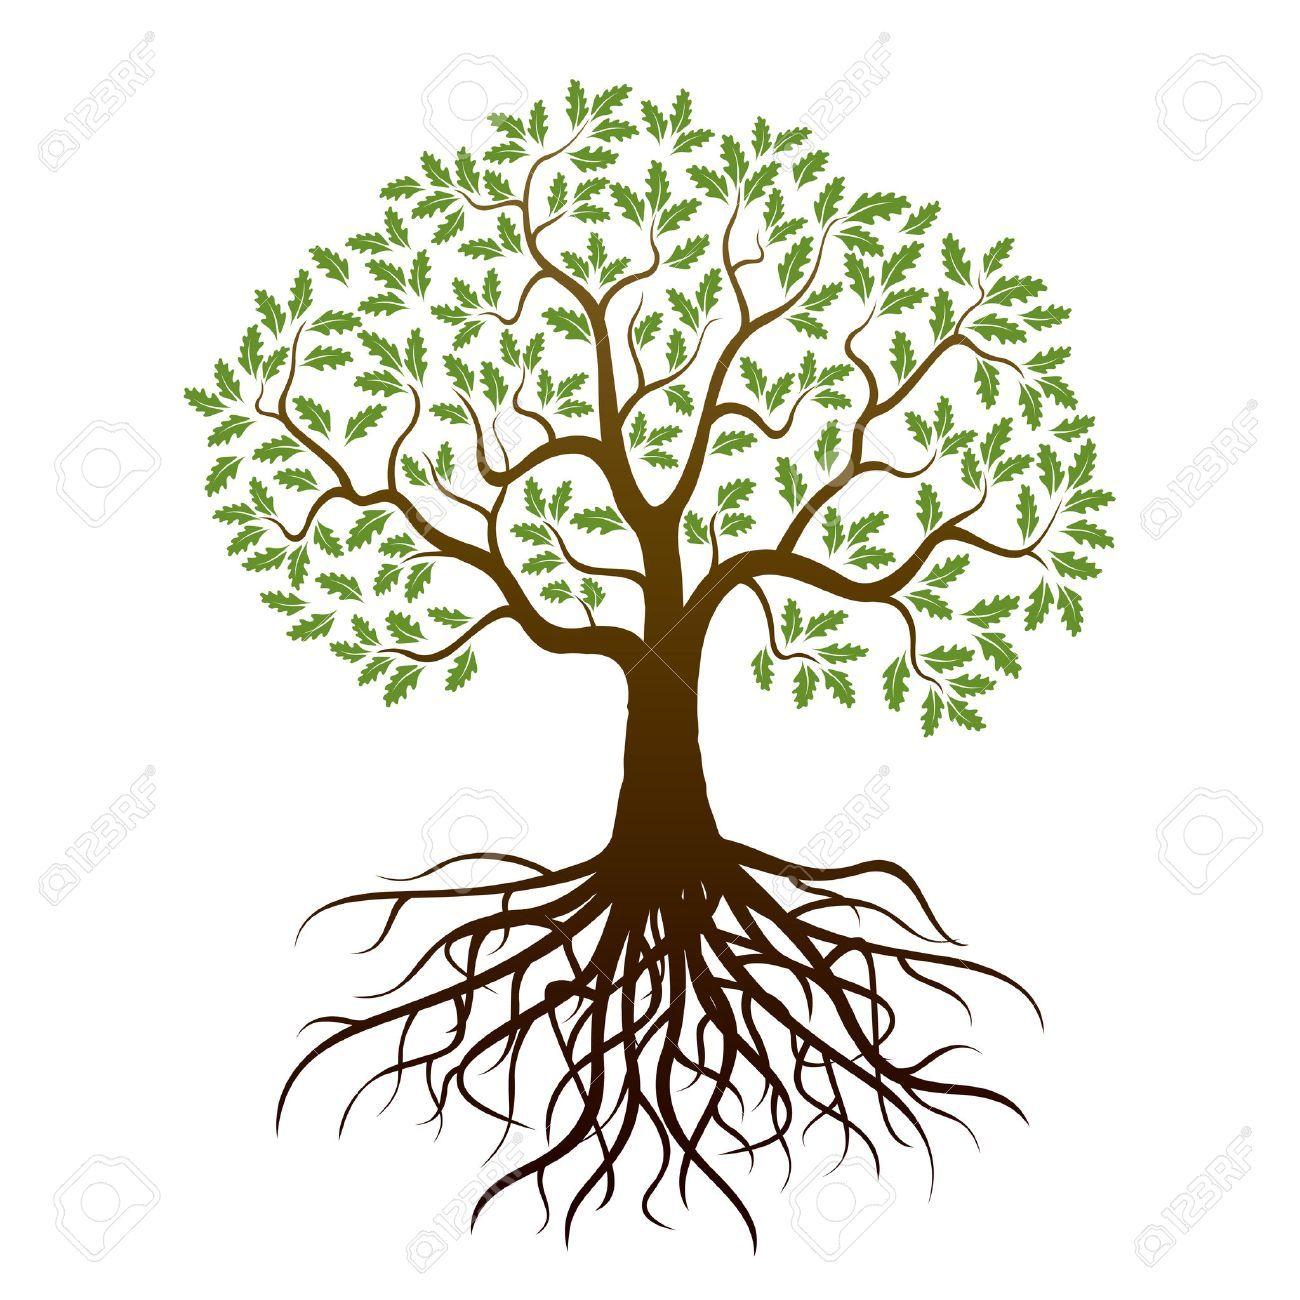 Oak Tree And Roots Vector Illustration Oak Tree Drawings Tree Illustration Oak Tree Pictures